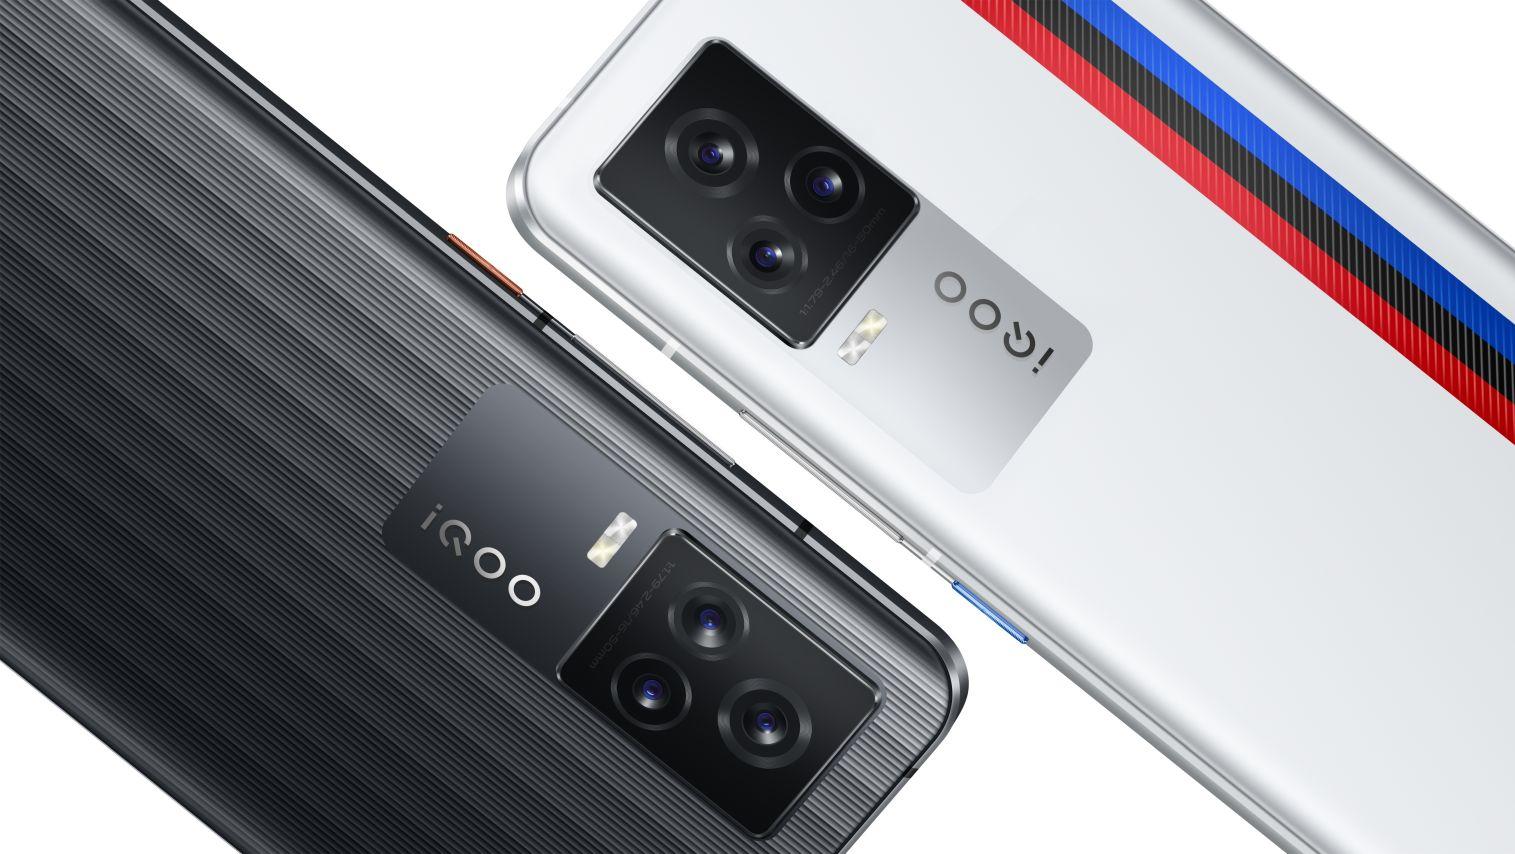 iQOO 7 & iQOO 7 Legend – Release, Pricing & Availability